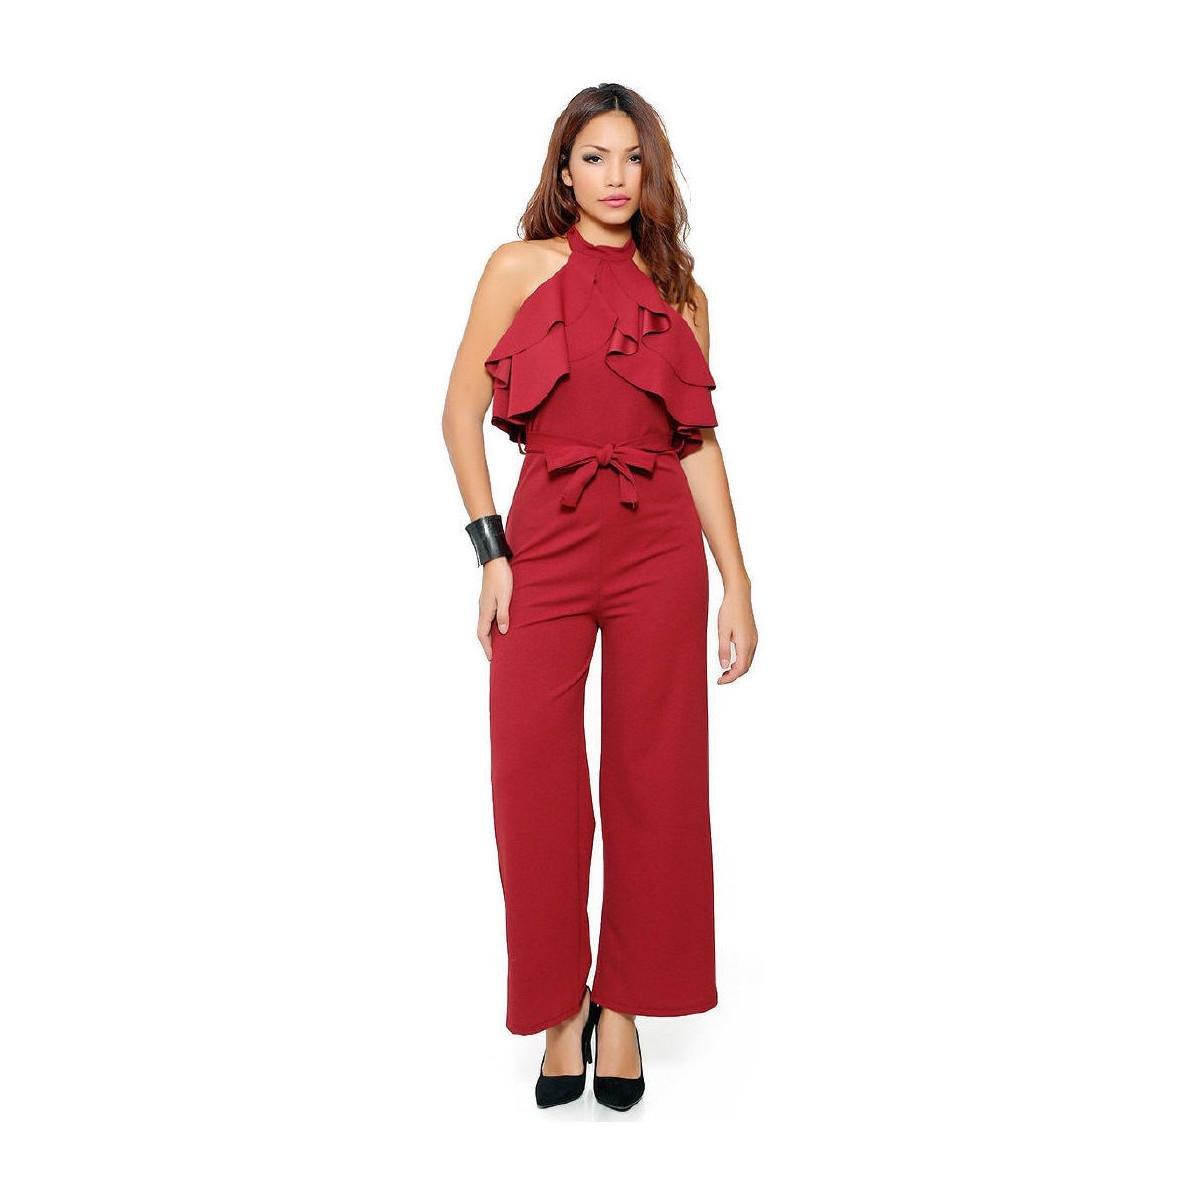 edea6ecb66e Infinie Passion Burgundy Jumpsuit 00w060883 Women s Jumpsuit In Red ...